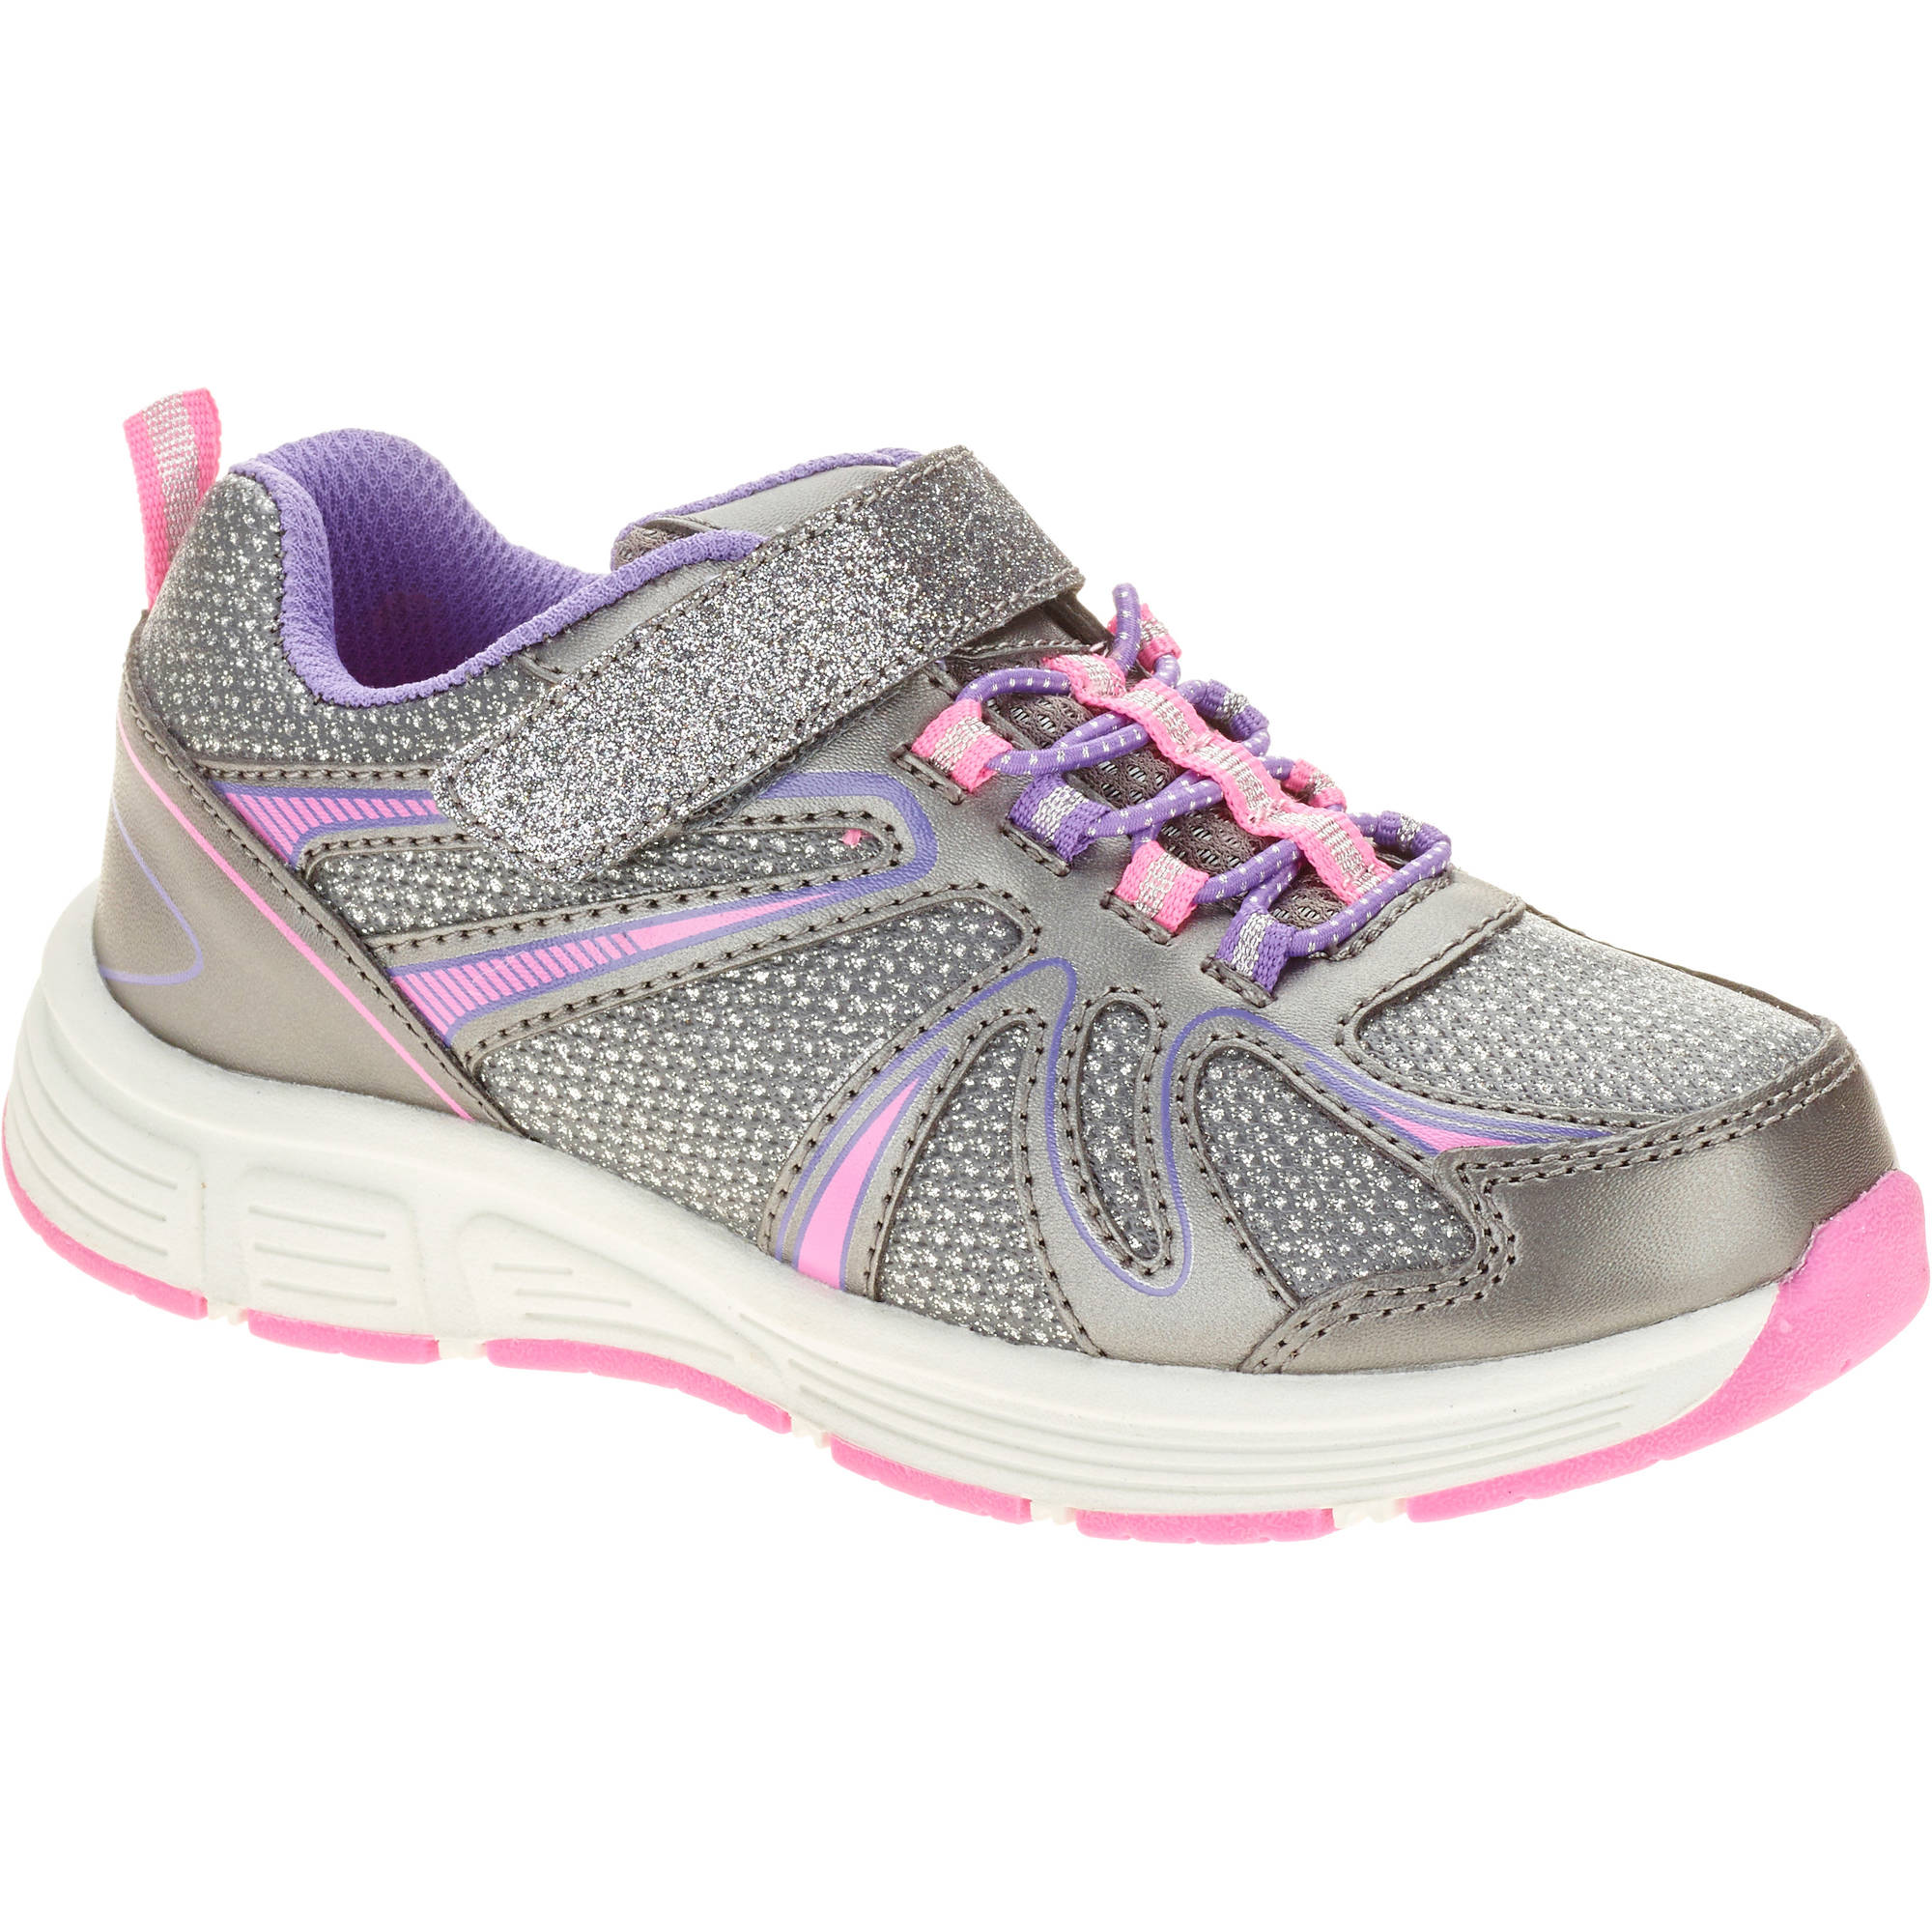 Danskin Now Girls' Glitter Running Shoe by